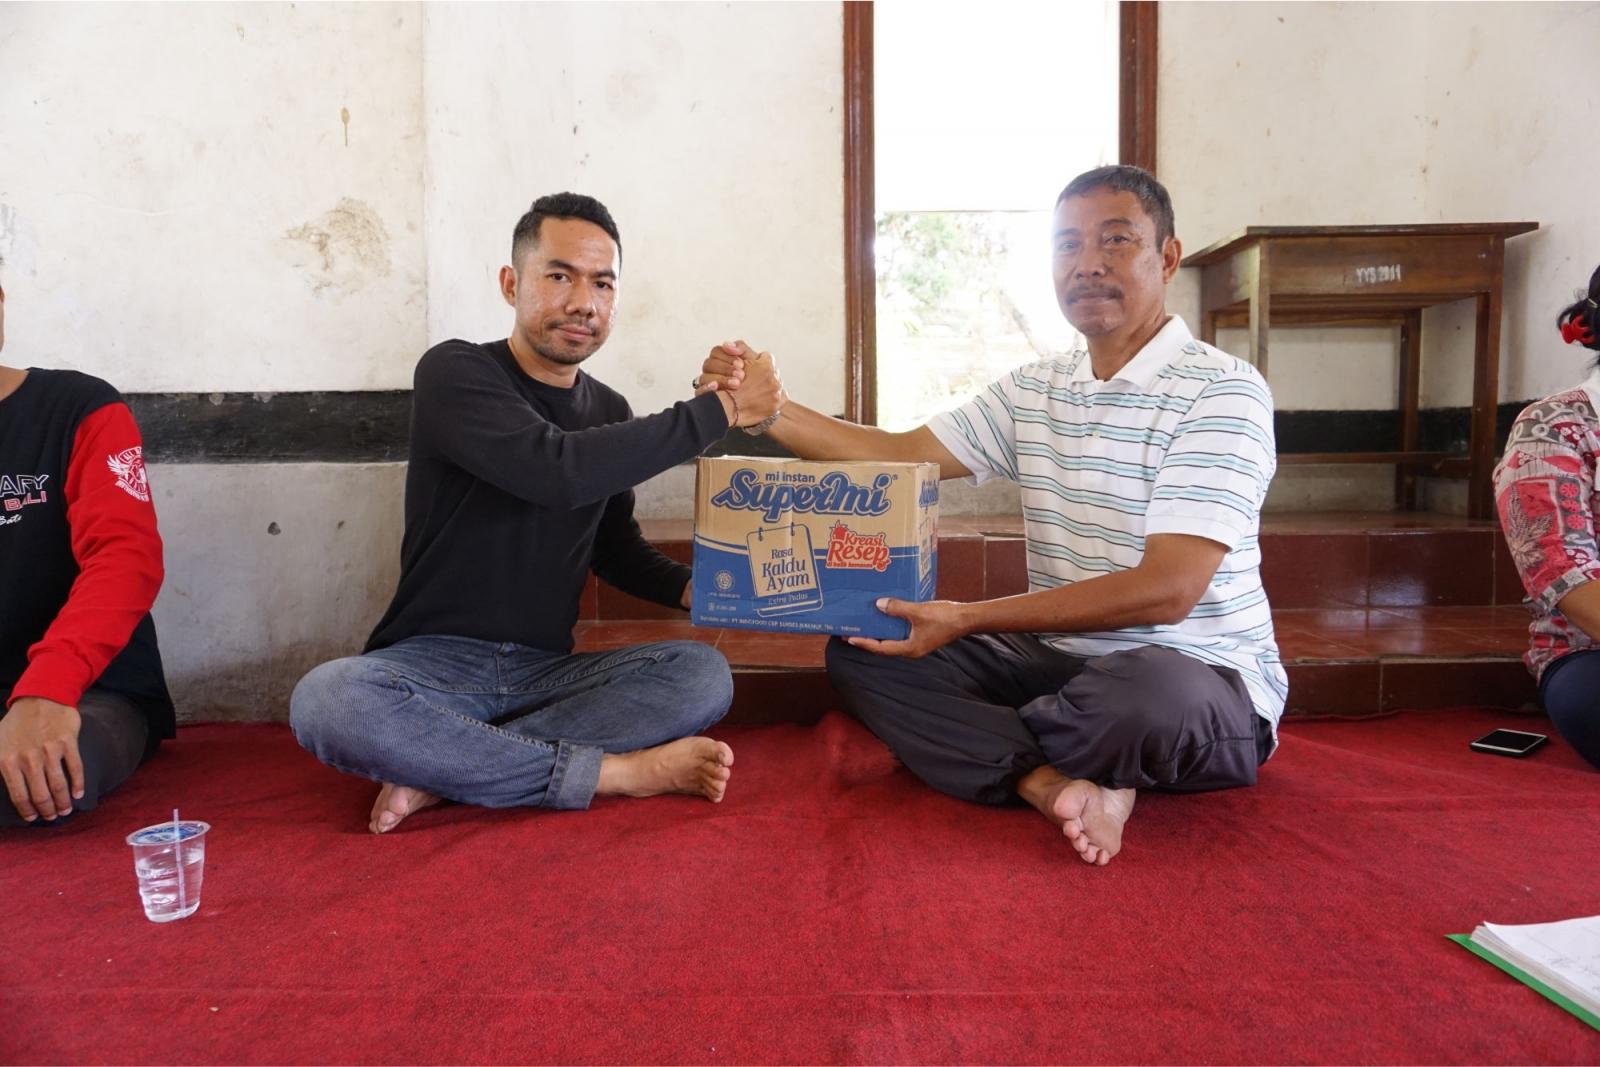 Bali Emporio Architect Team Conducts Charity Activities to Yasa Kerti Karangasem Orphanage Foundatio 5